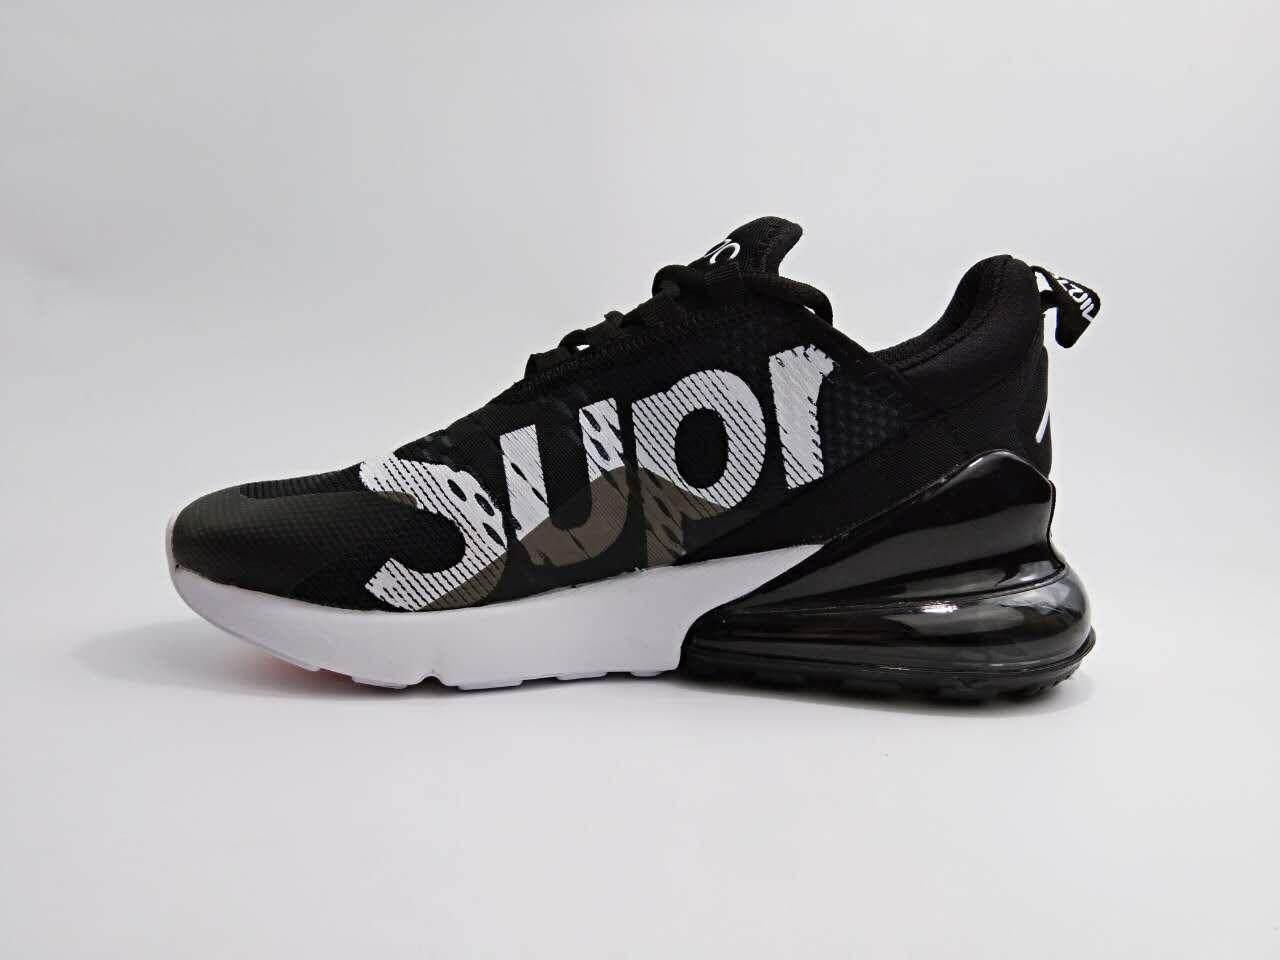 the latest 0e6e9 1c2b6 Nike Air Max 270 Mens Sports Running Shoes